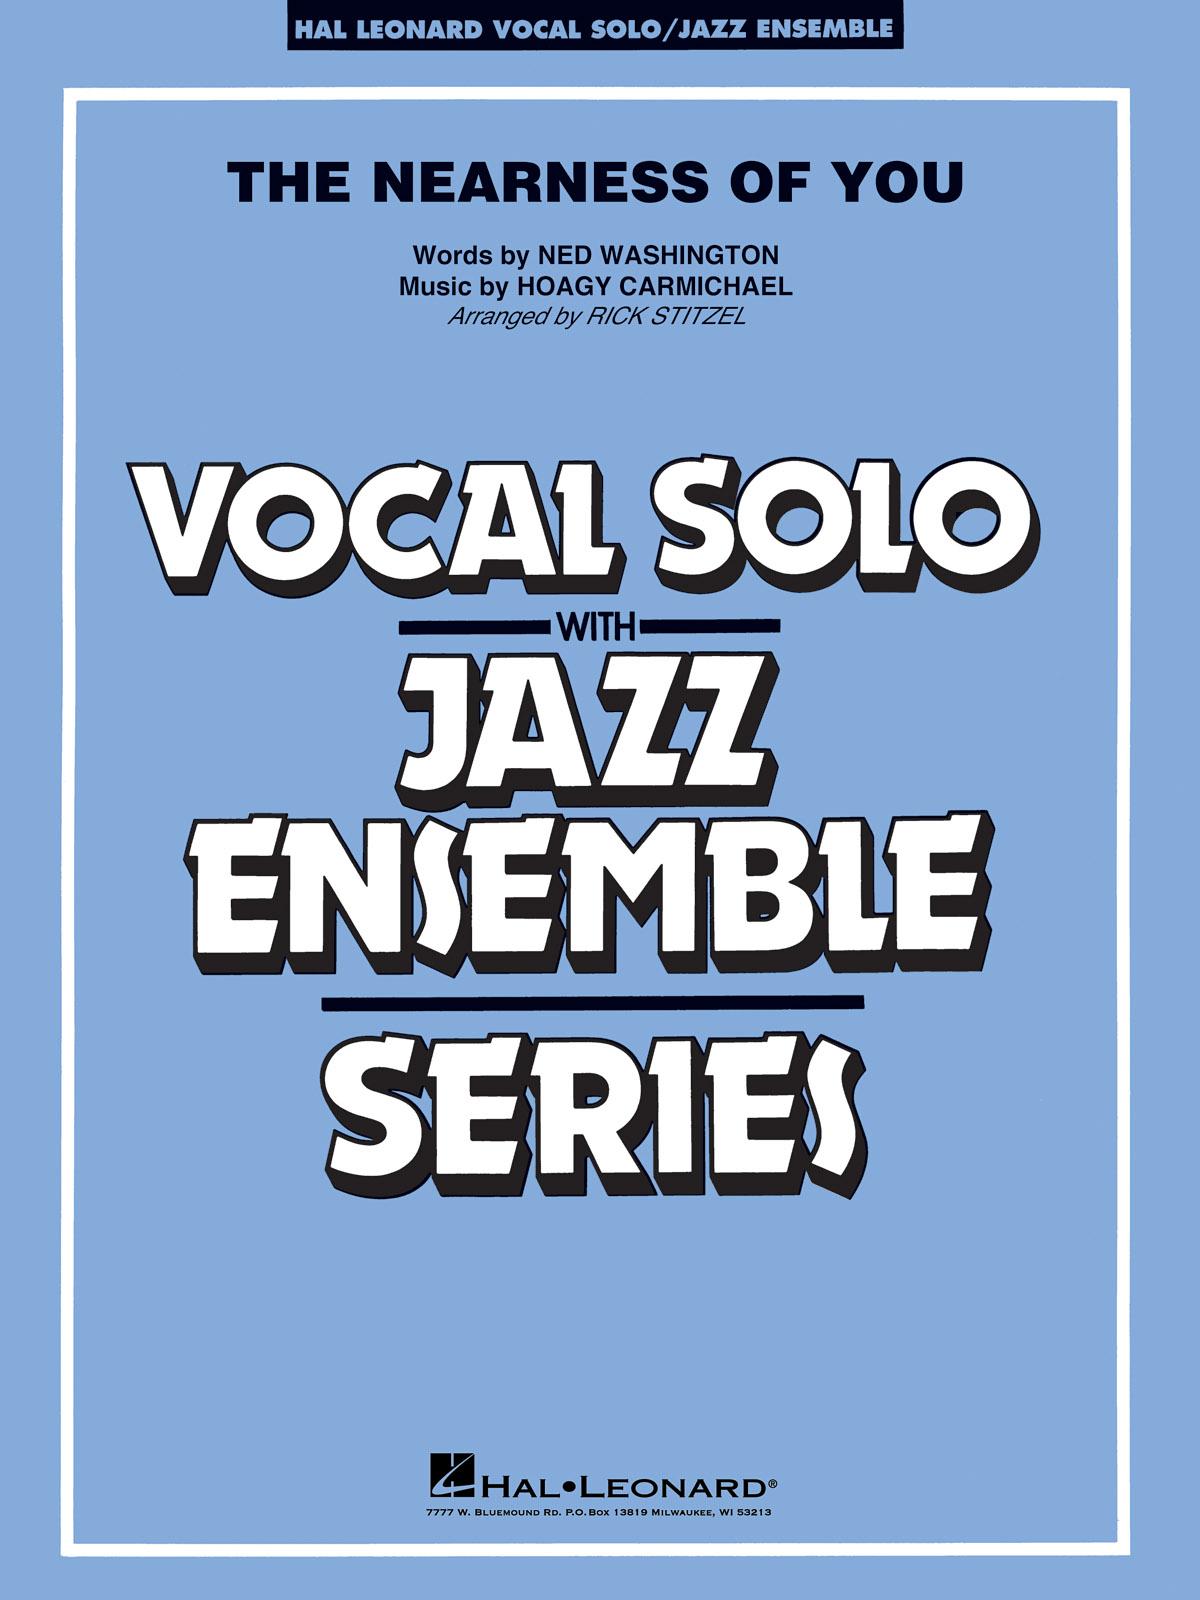 Hoagy Carmichael Ned Washington: The Nearness of You (Key: C): Jazz Ensemble and